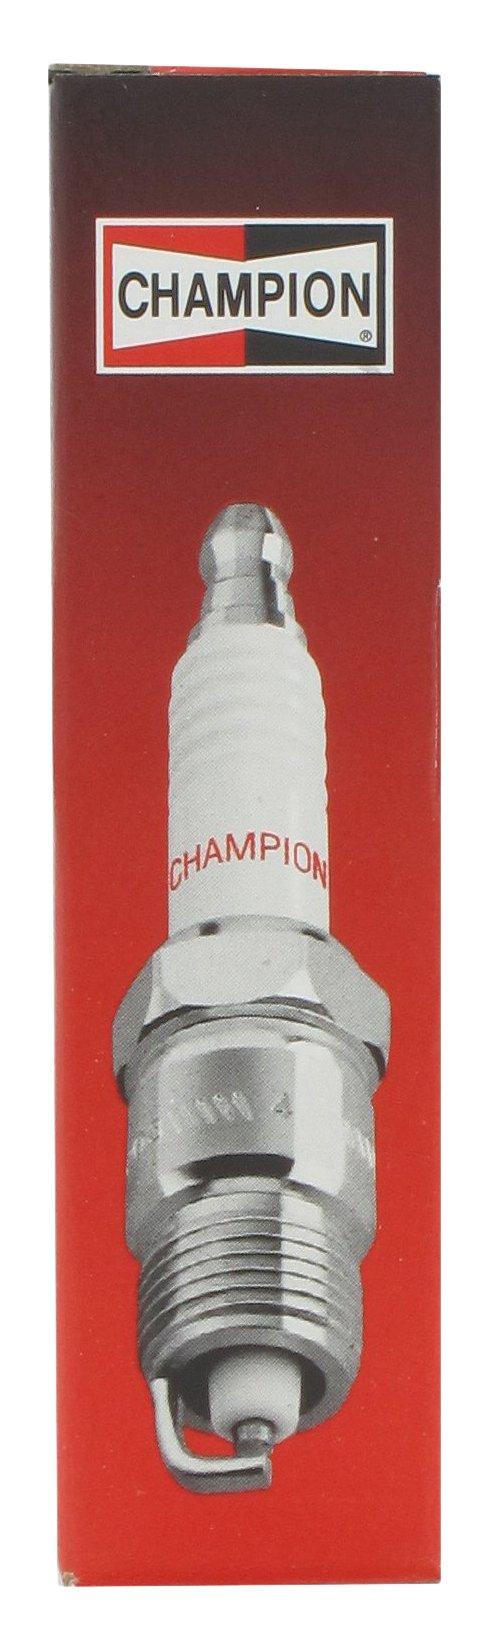 Greenstar 1694 Bougie Champion RJ19LMC